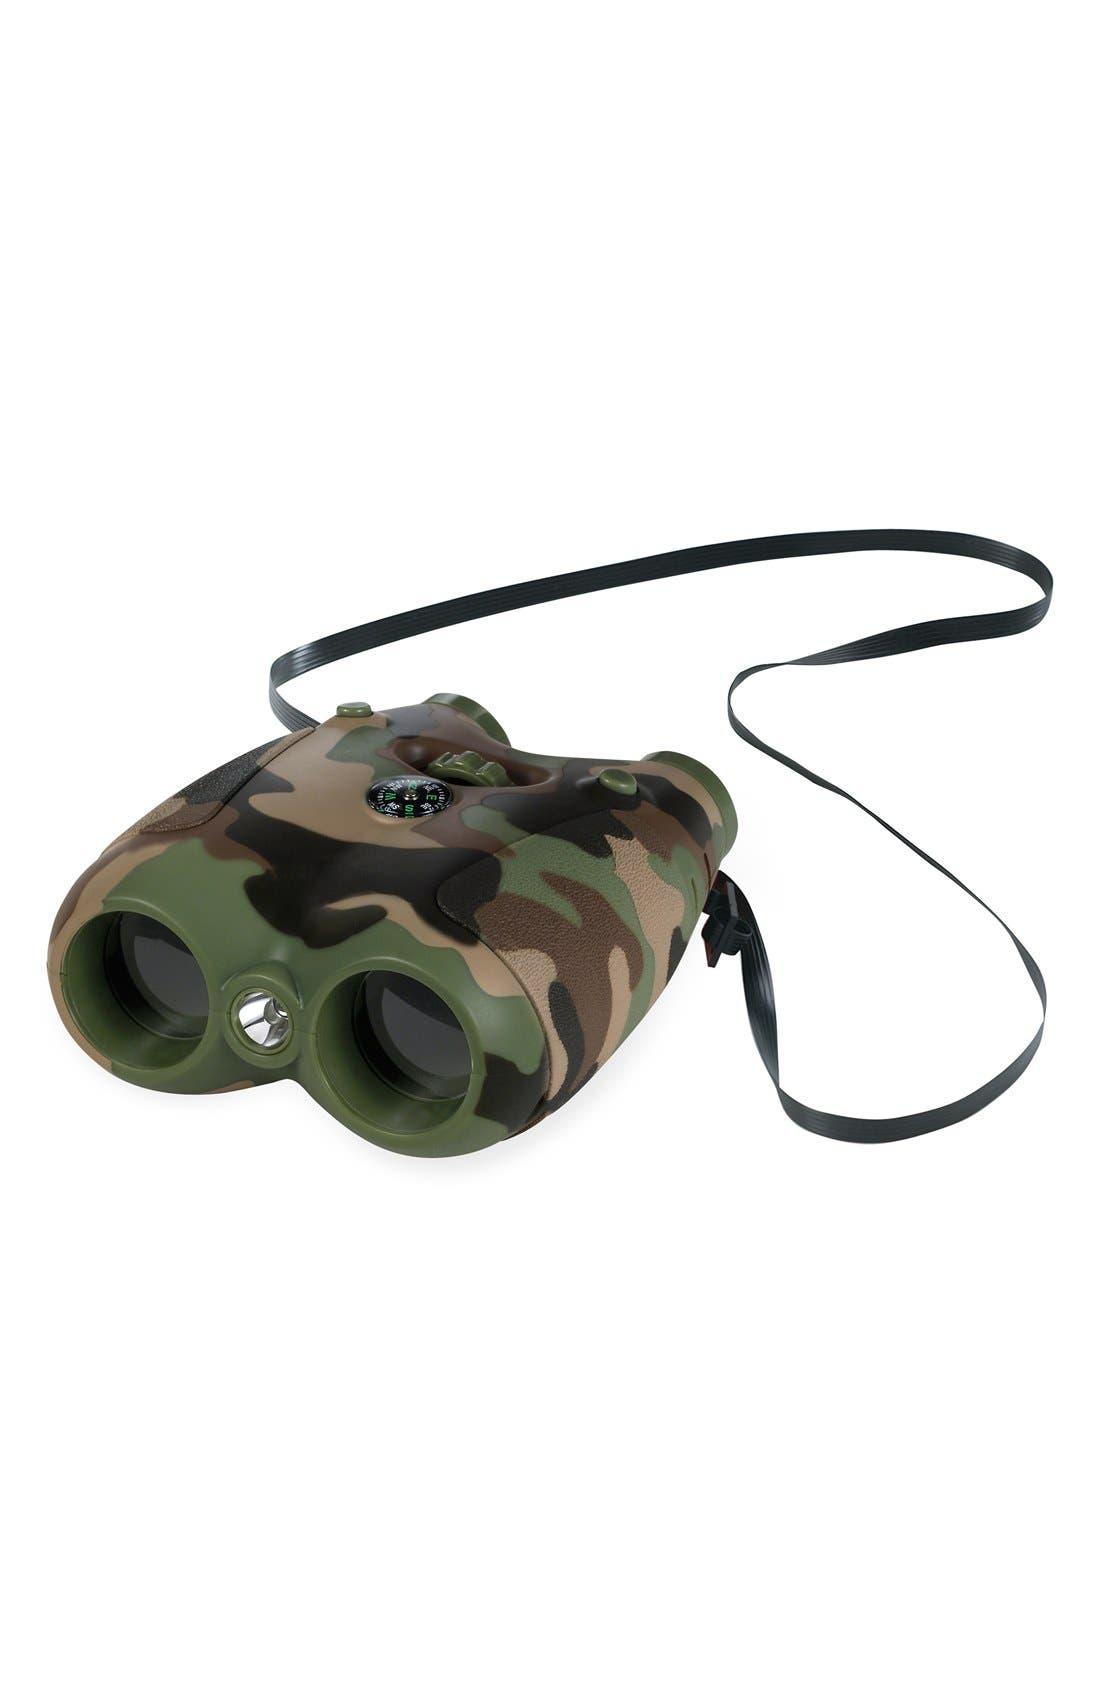 Camouflage Binoculars,                             Main thumbnail 1, color,                             NO COLOR